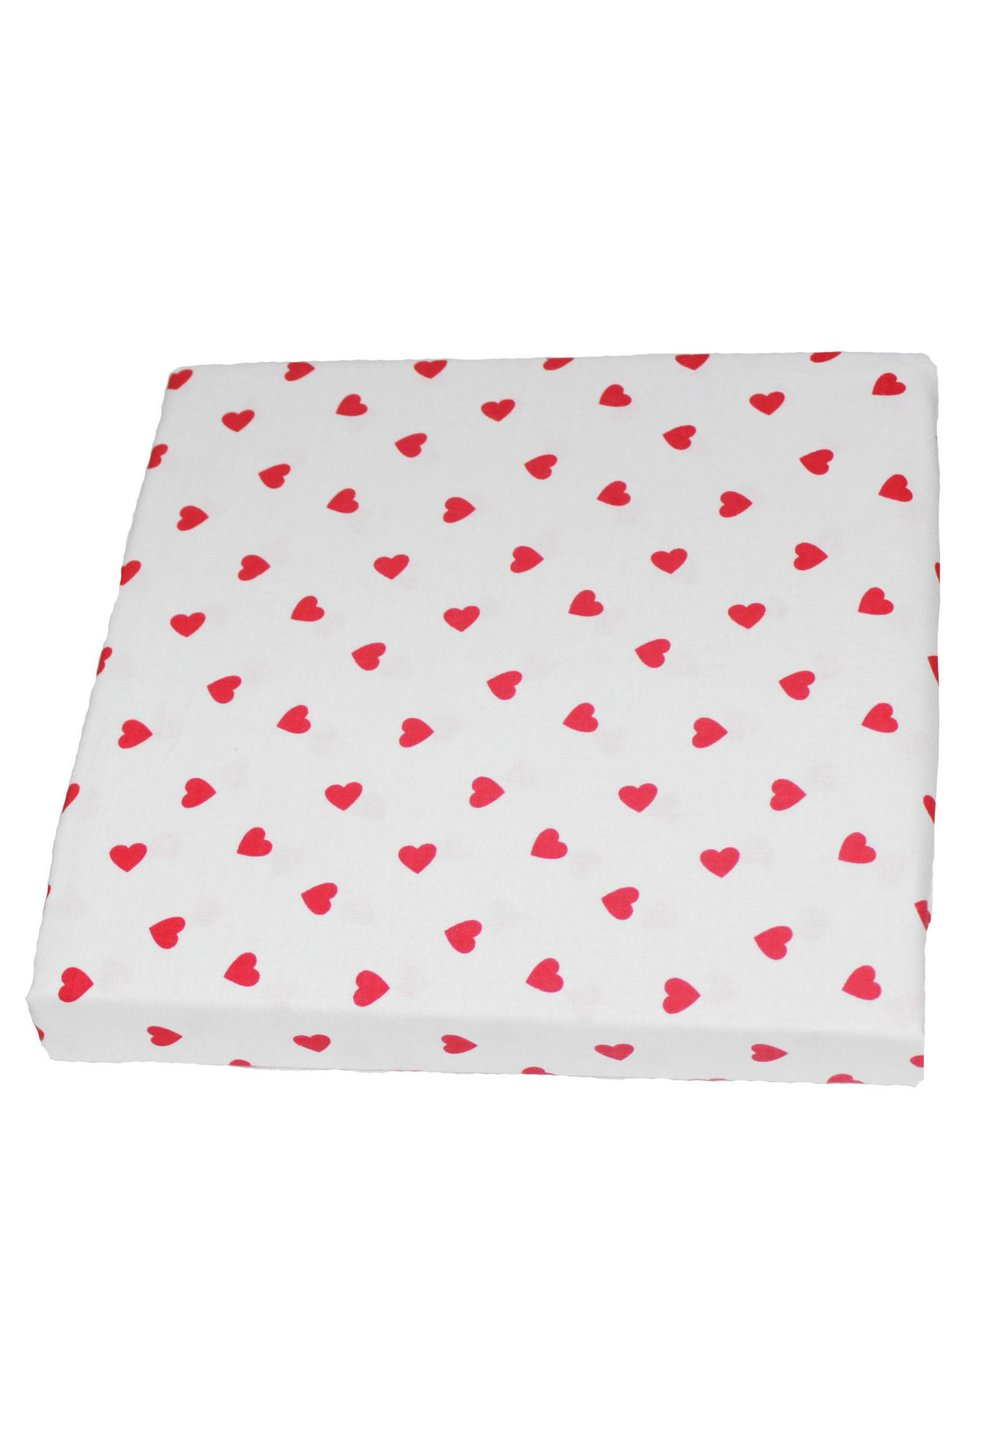 Cearceaf patut, Red hearts, 120x60cm imagine